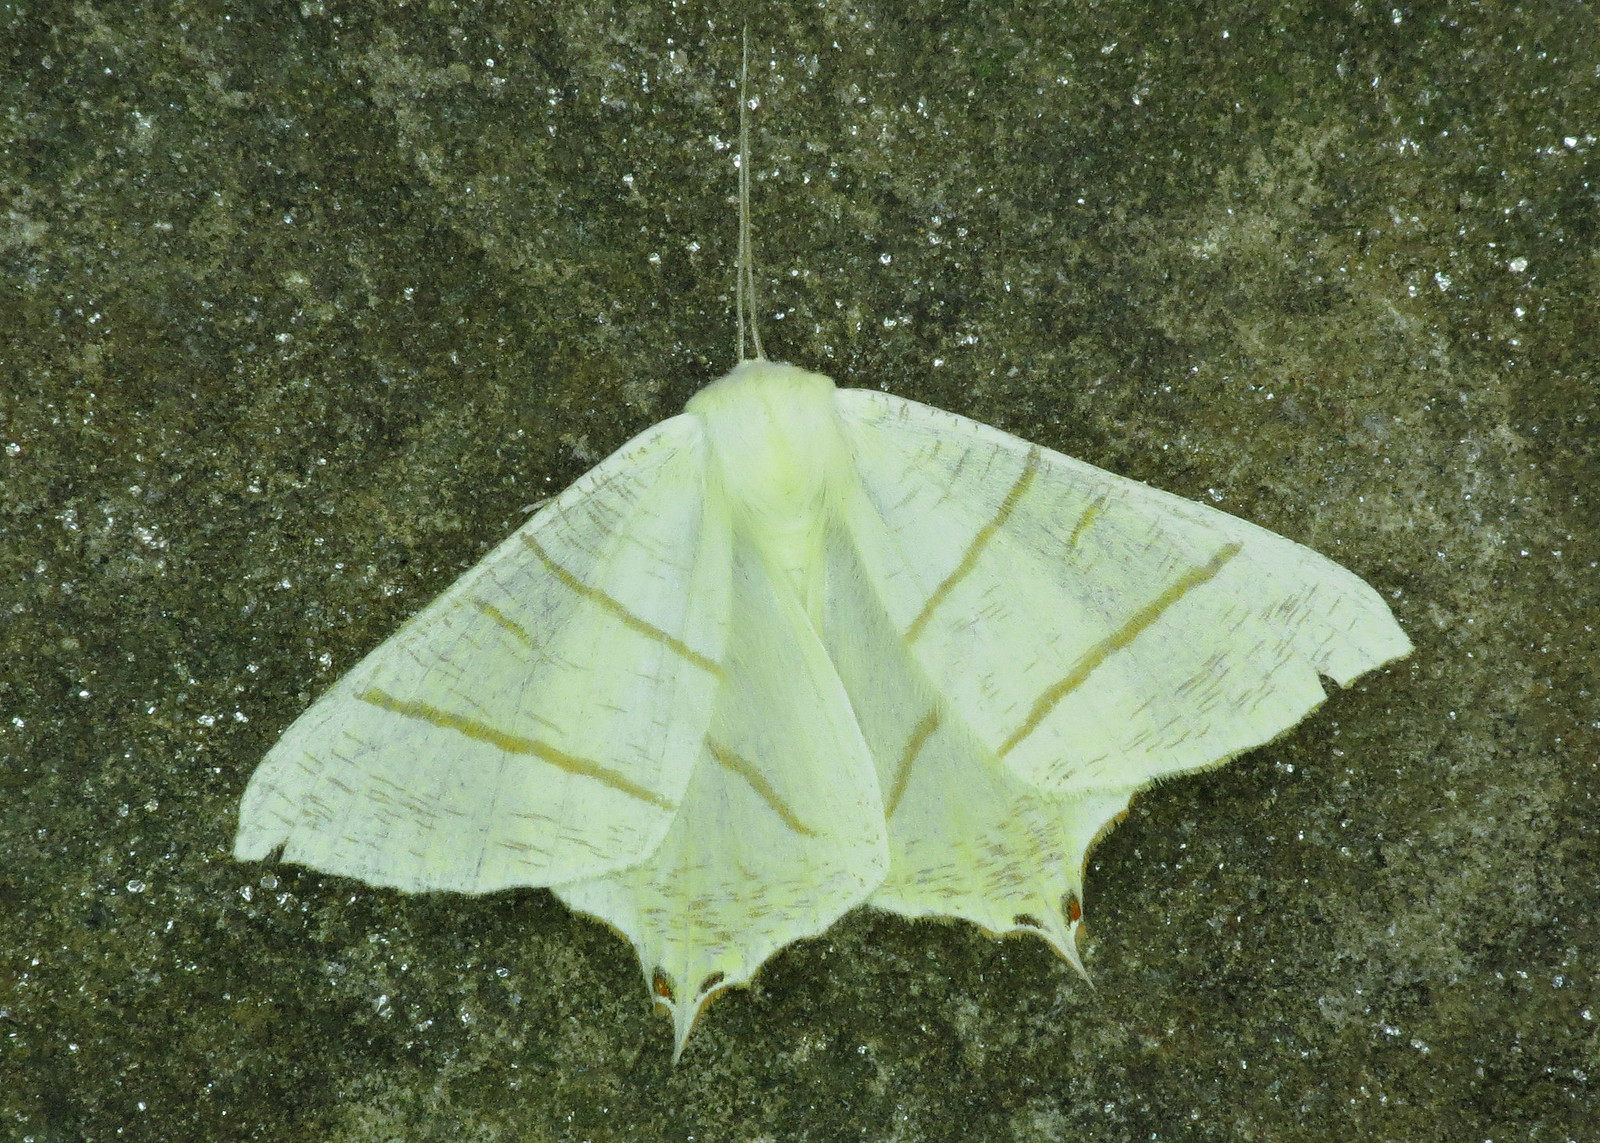 1922 Swallow-tailed Moth - Ourapteryx sambucaria